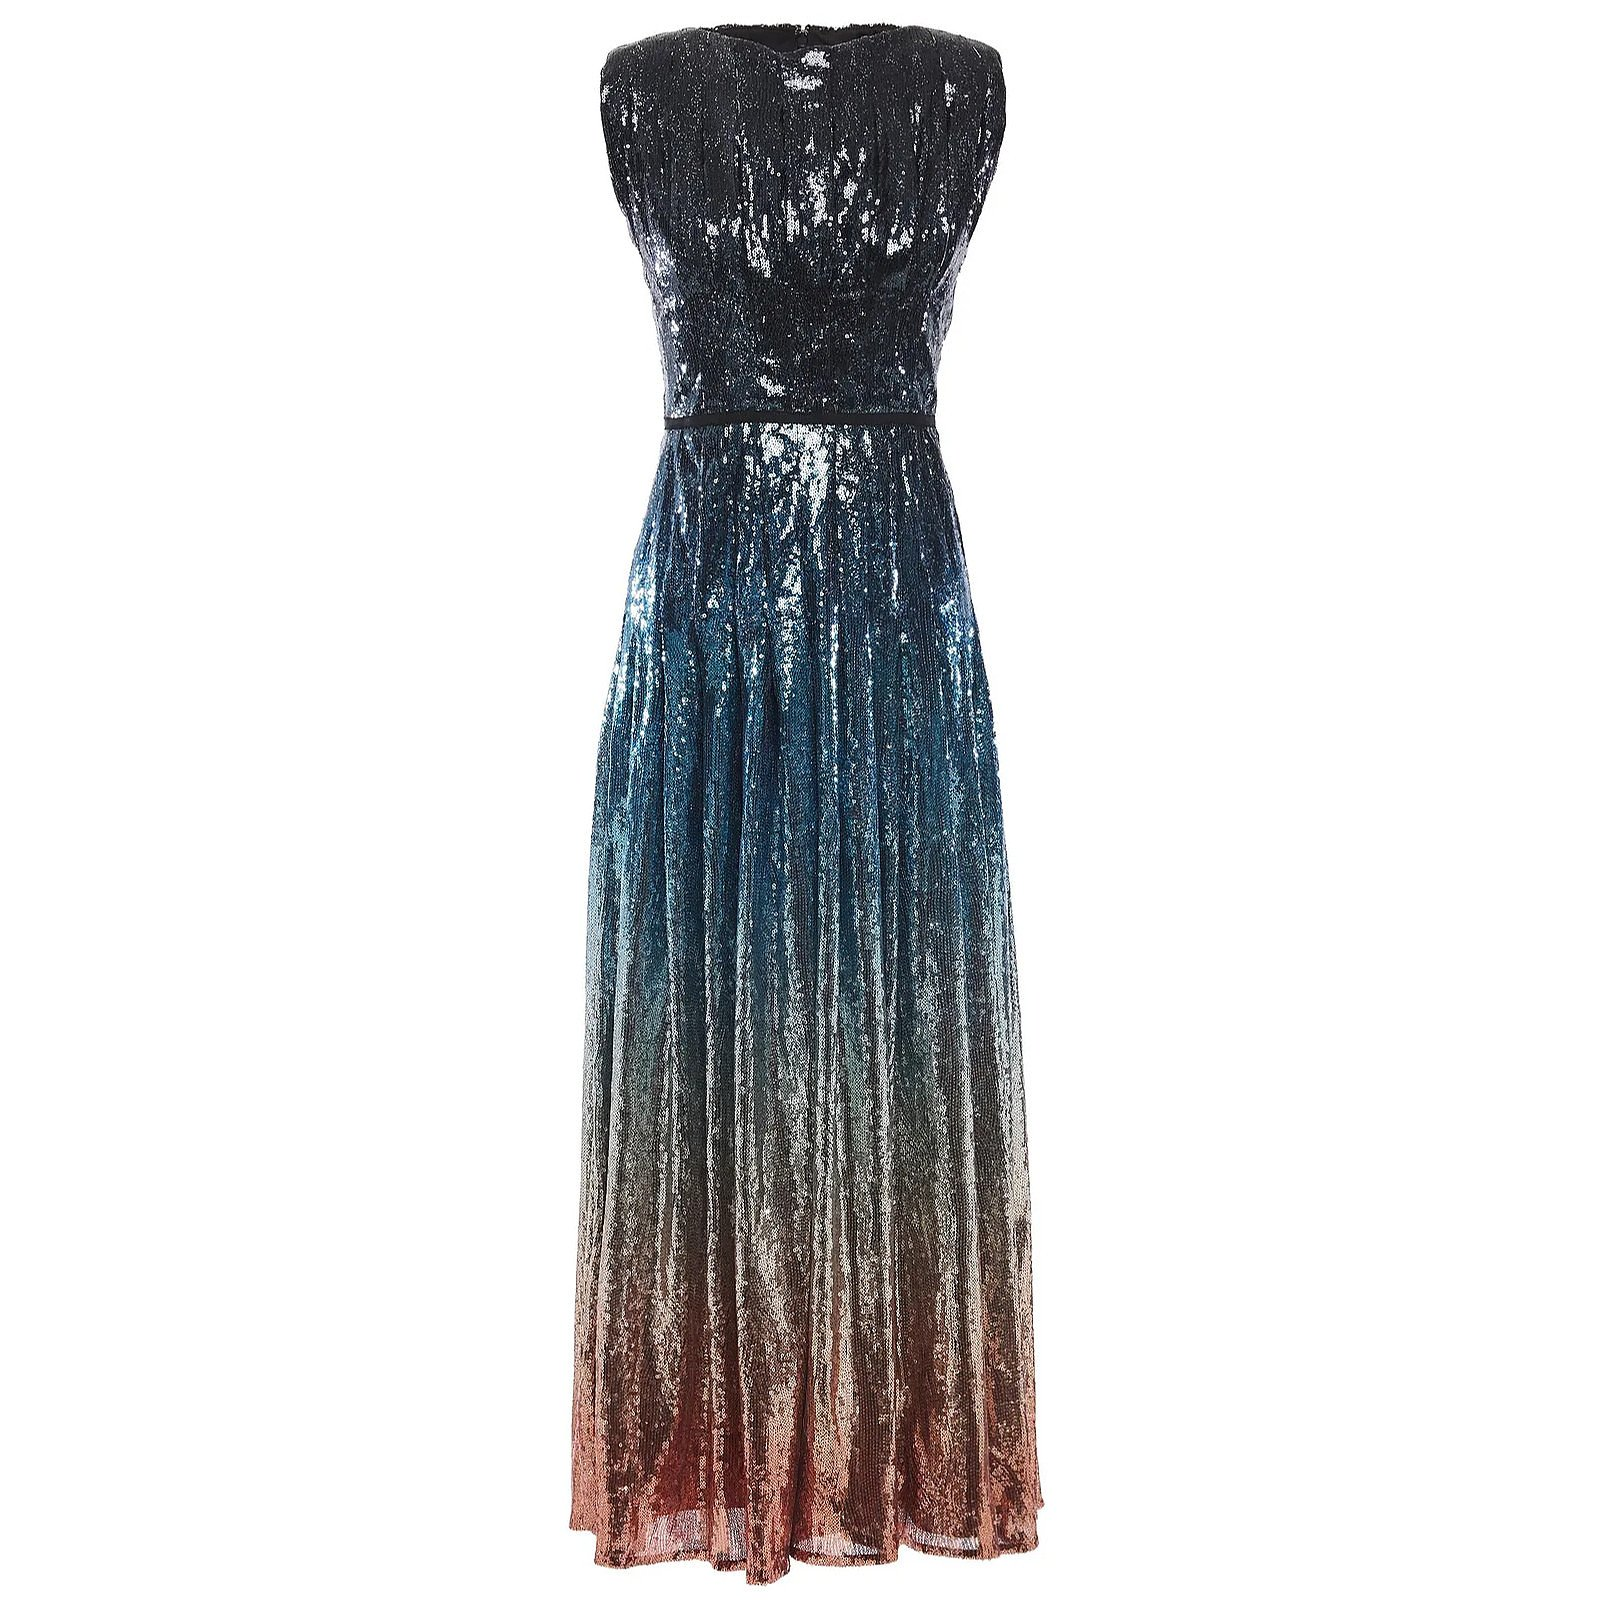 Mary Katrantzou Sienna Sequin Dress